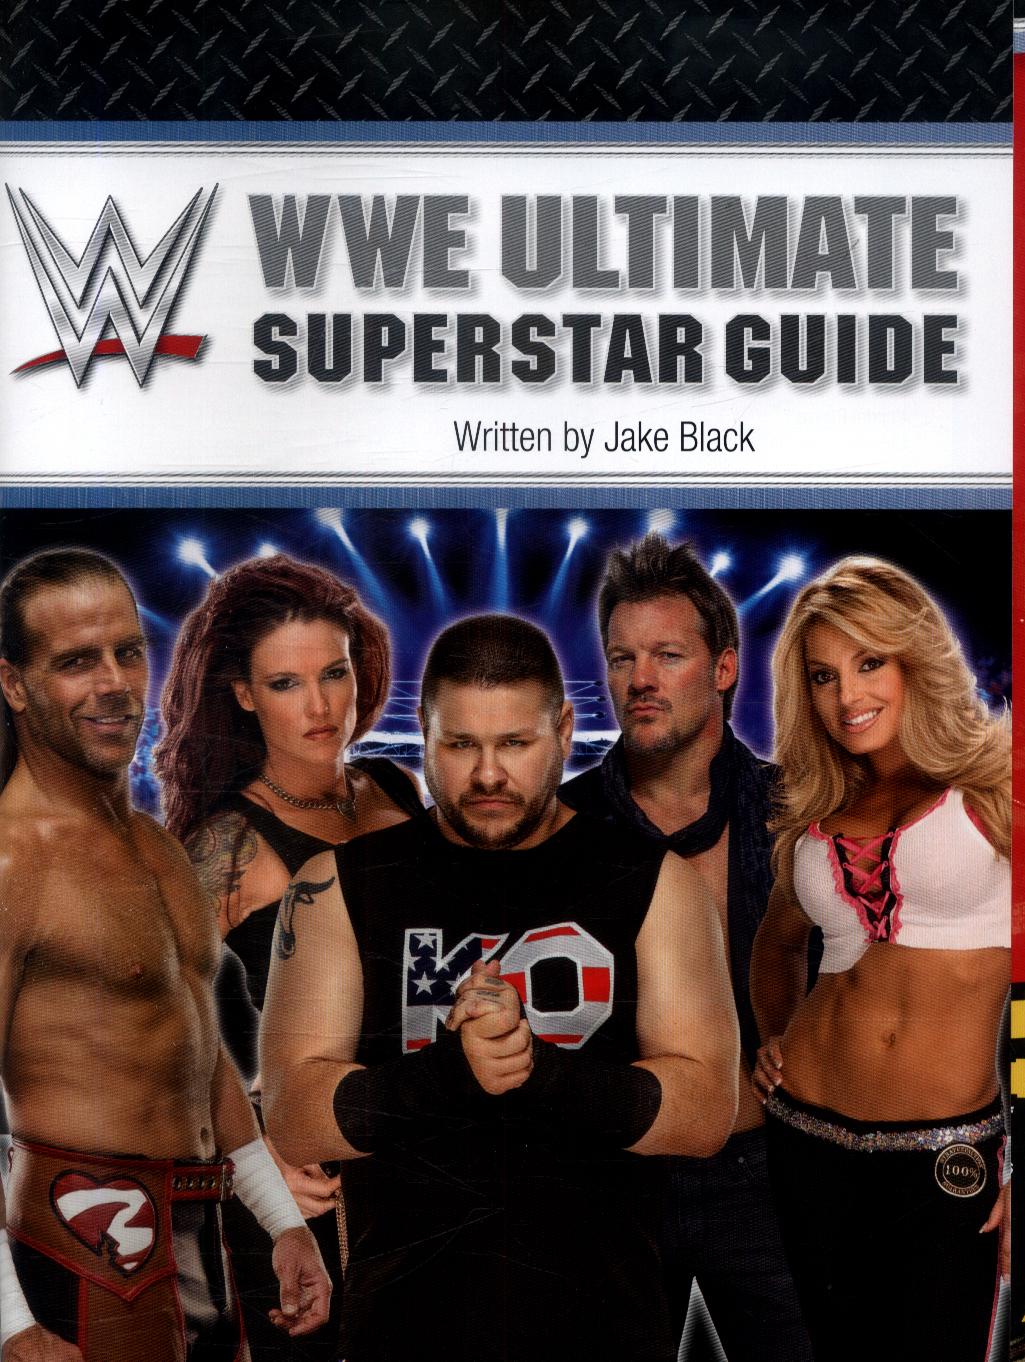 wwe superstar ultimate guide